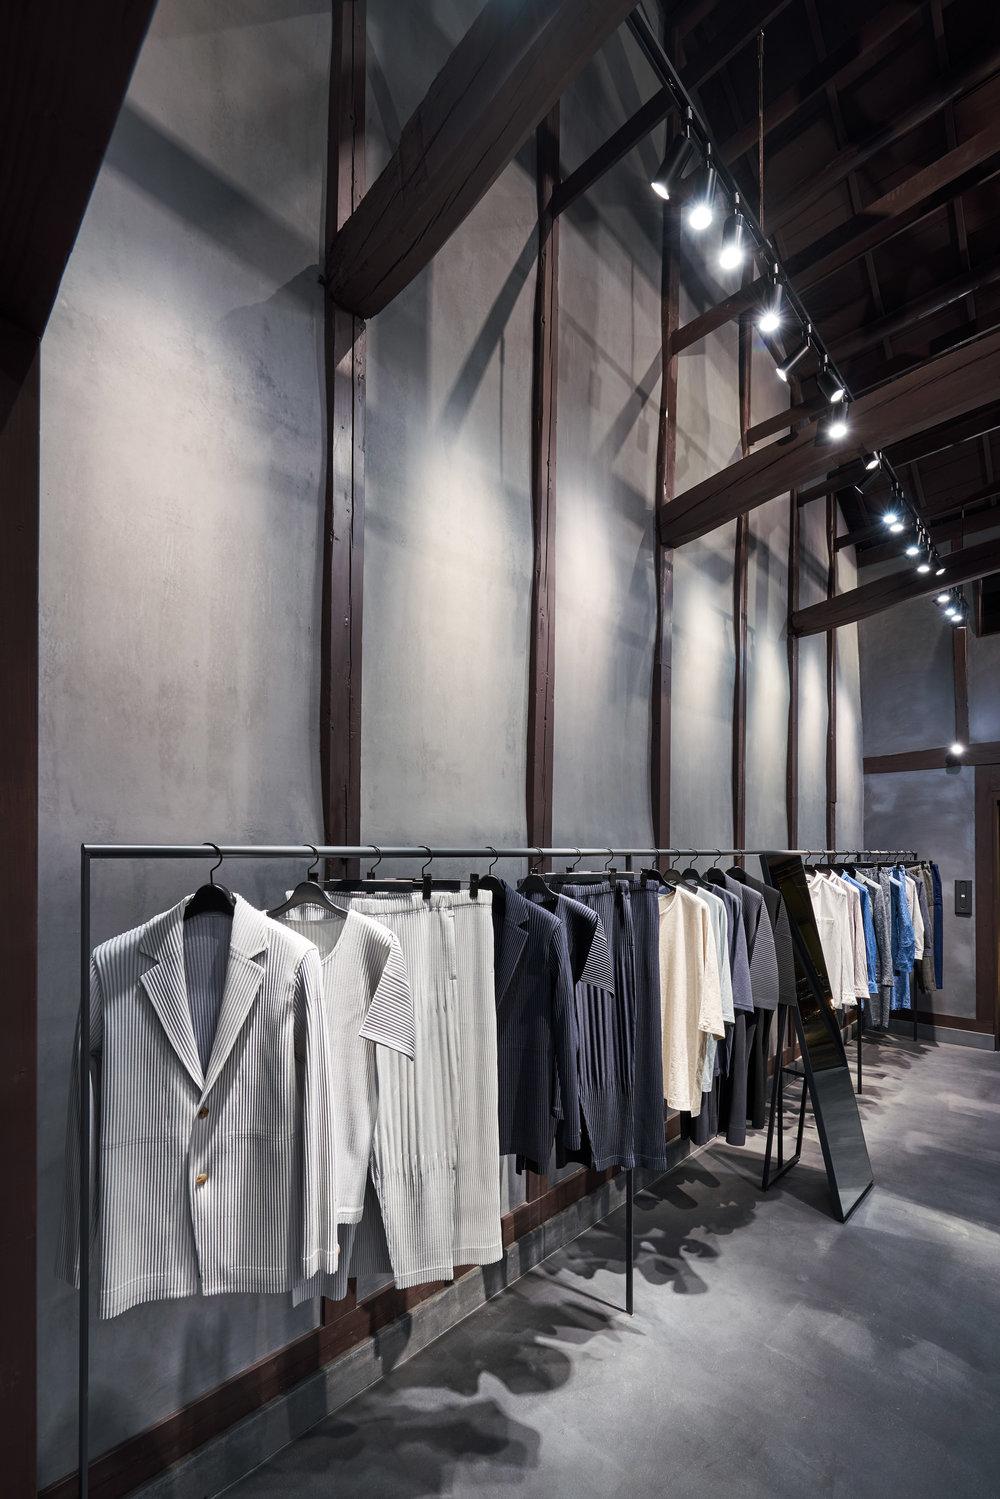 interiors-retail-shops-issey-miyake-kyoto-japan_dezainaa_4.jpg